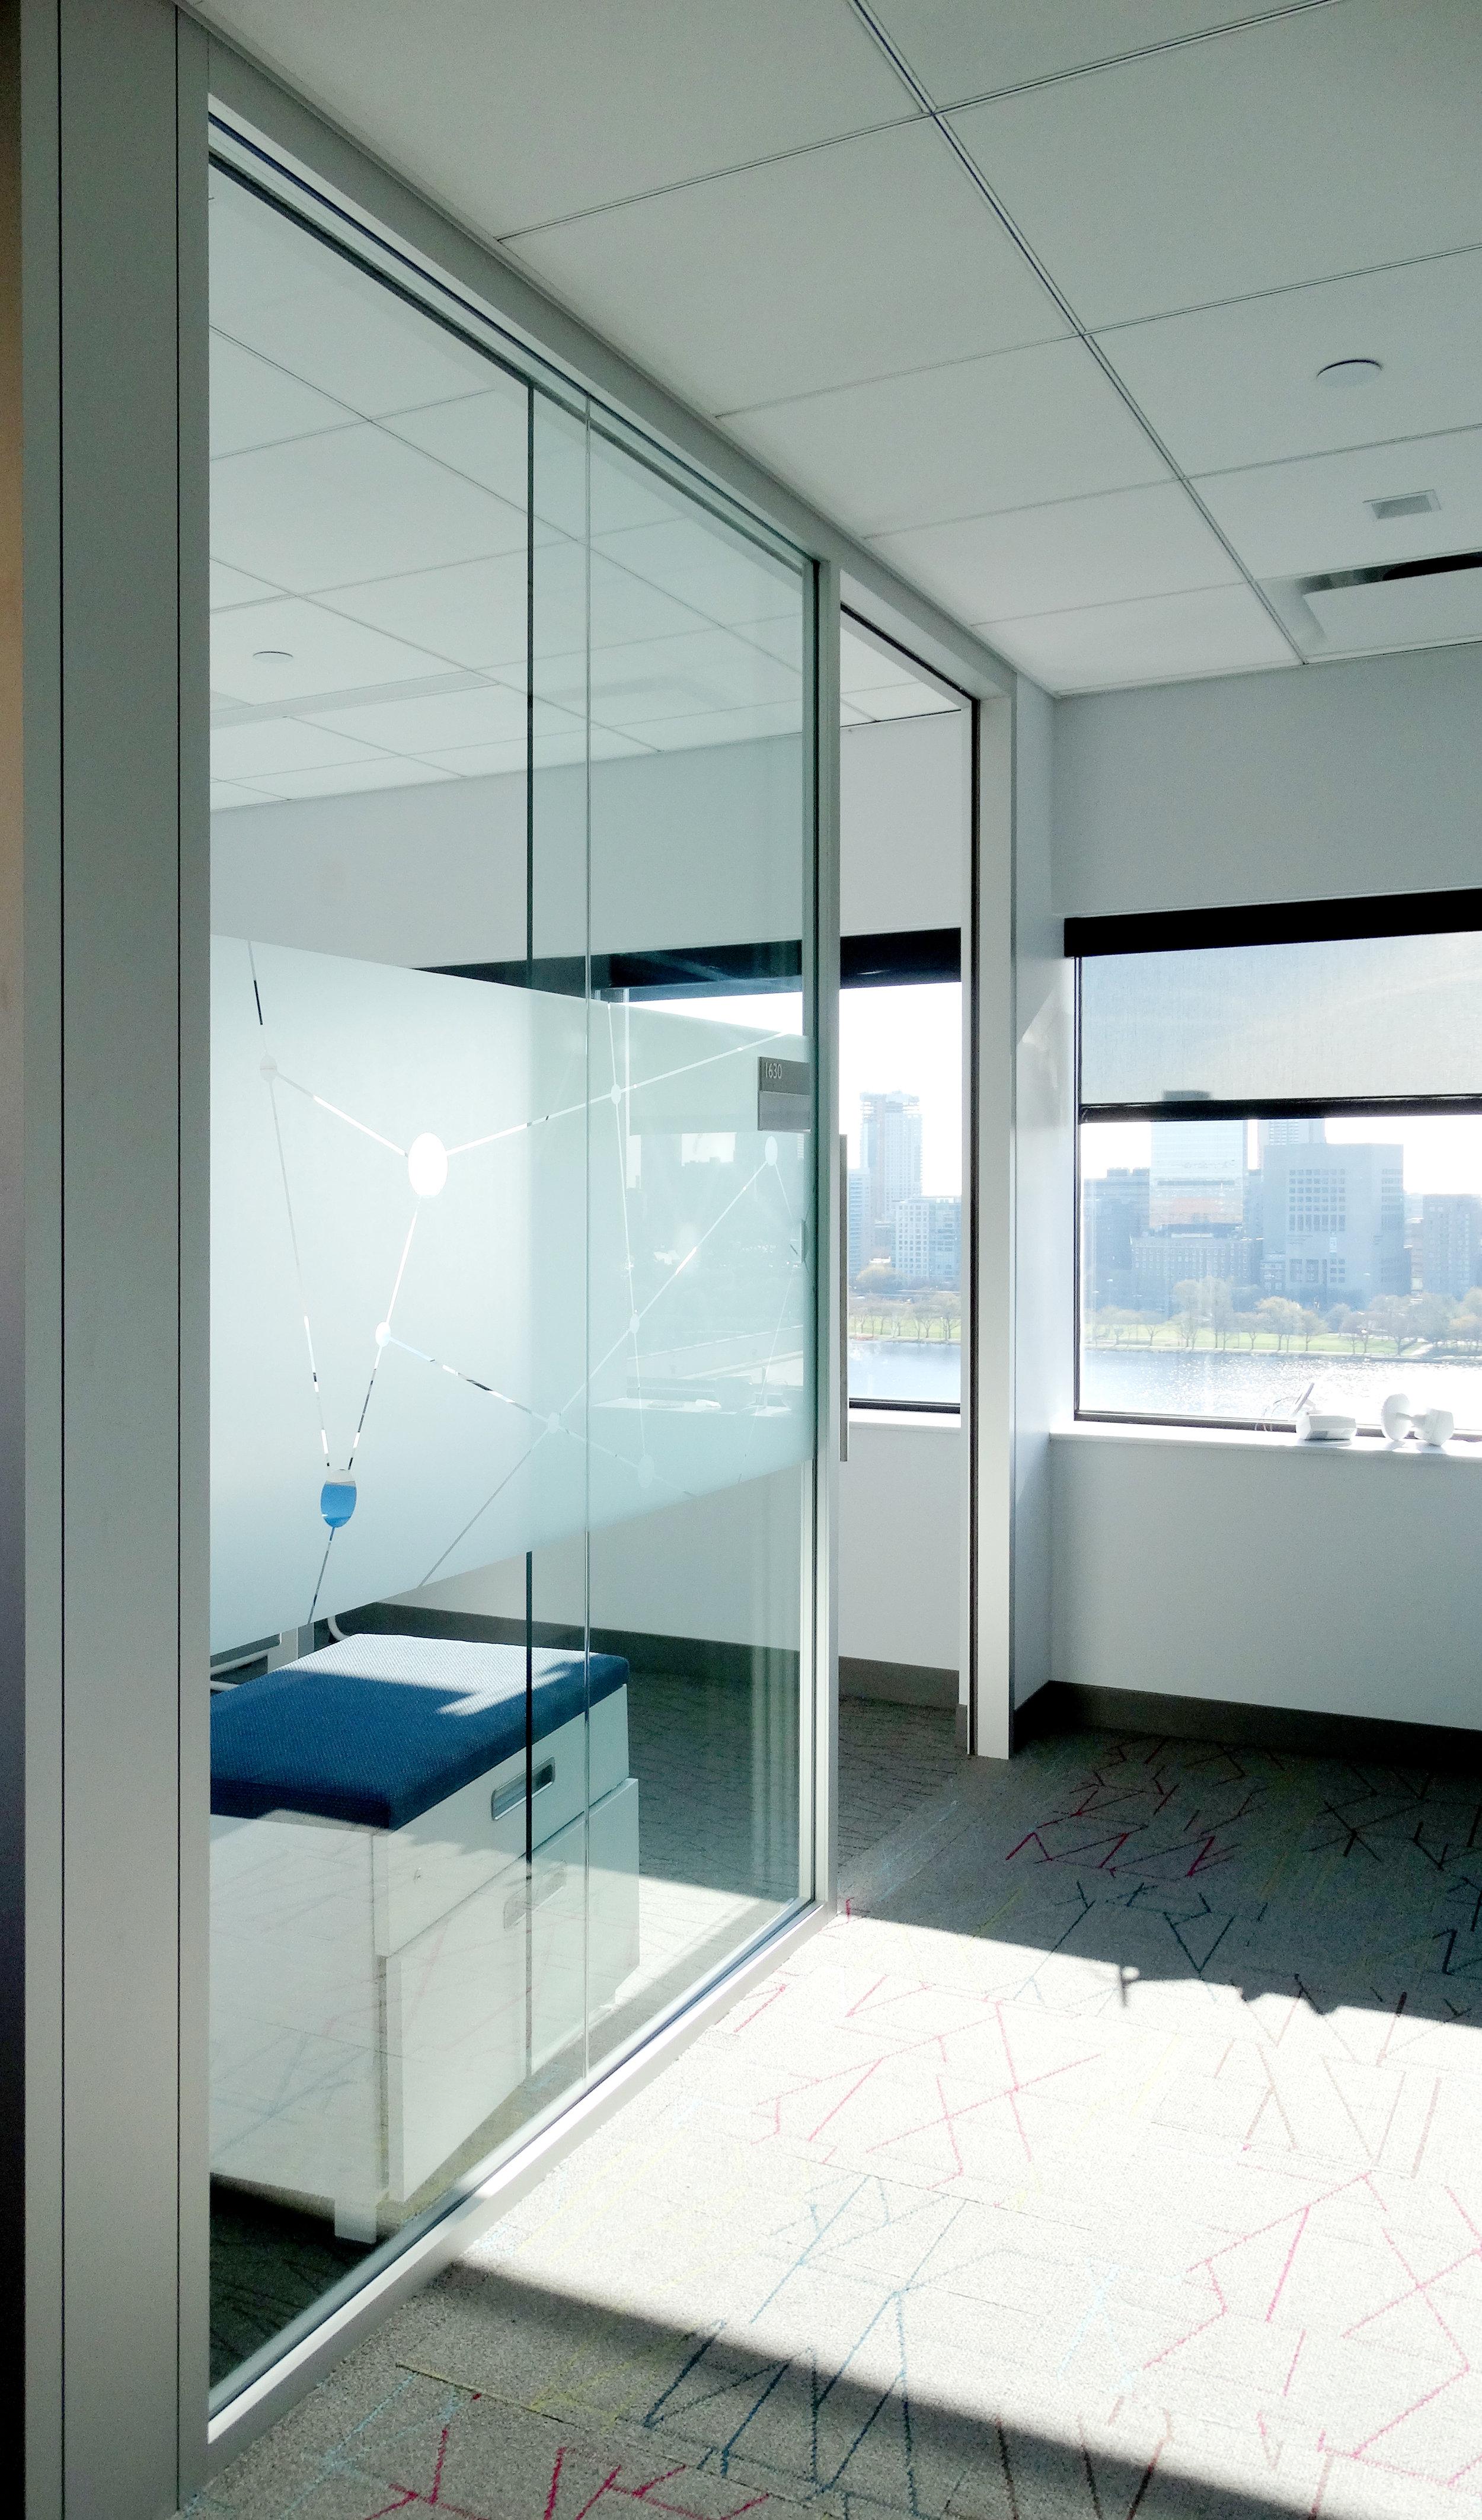 Litespace Glass Wall Specialty Film - Spaceworks AI.jpg